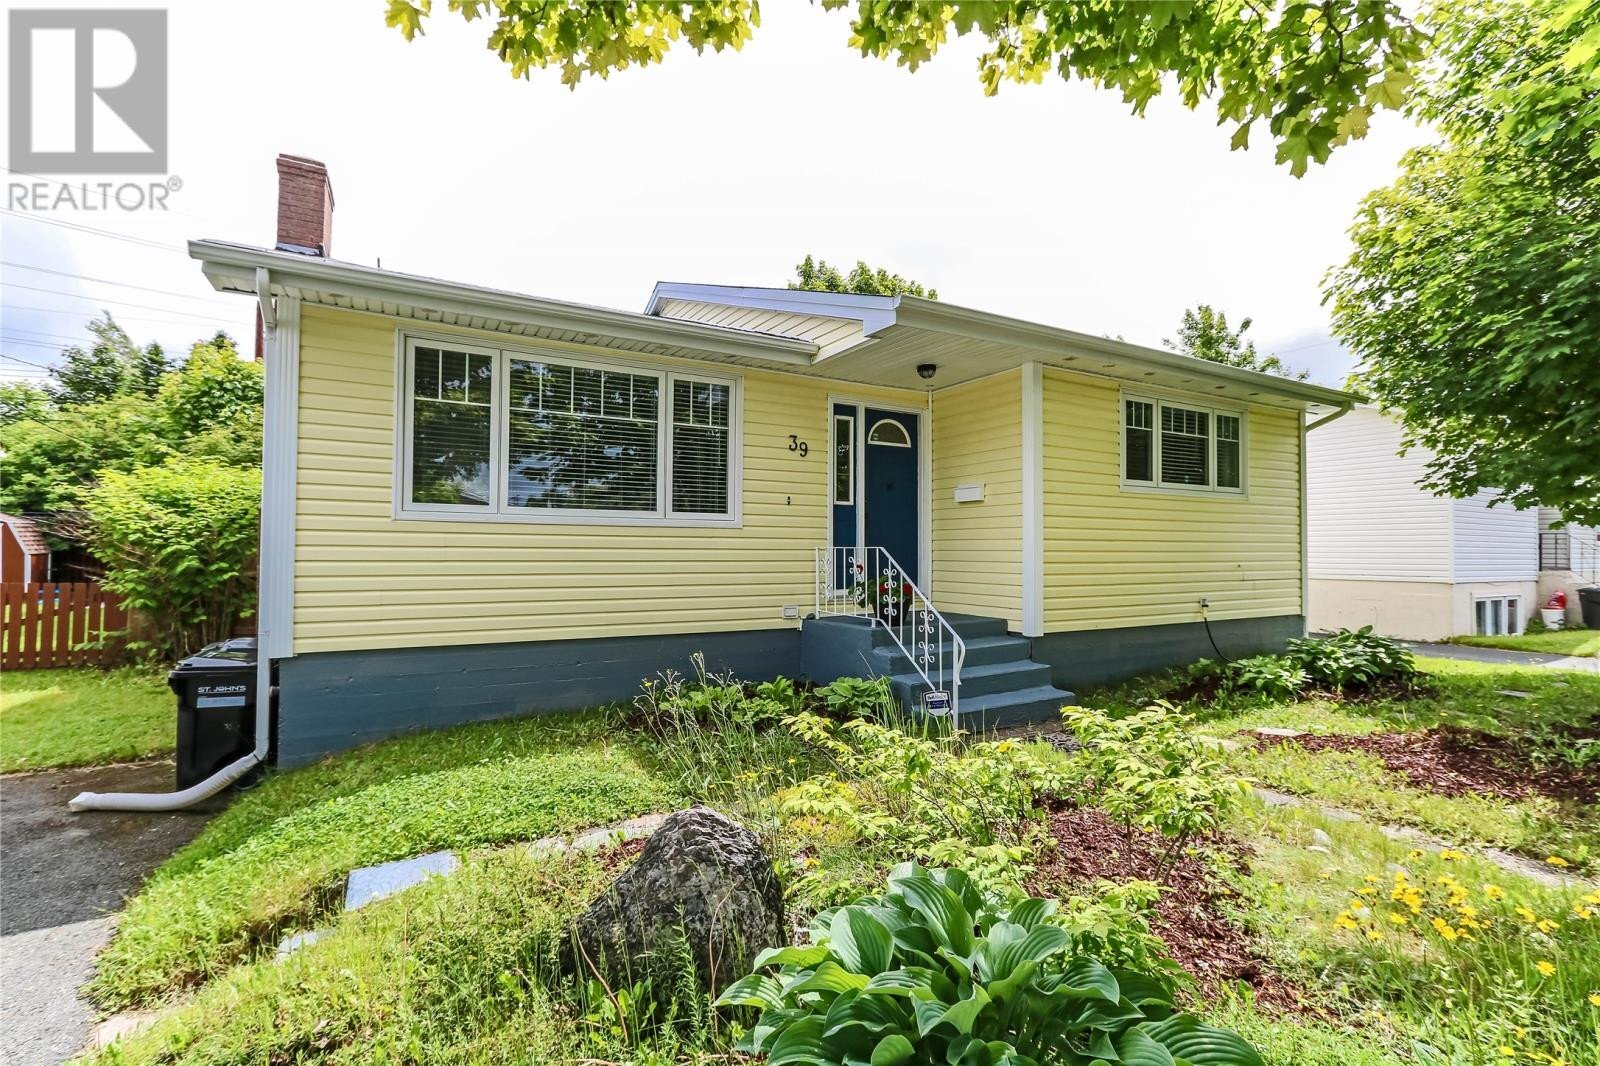 House for sale at 39 Neptune Rd St.john's Newfoundland - MLS: 1223760